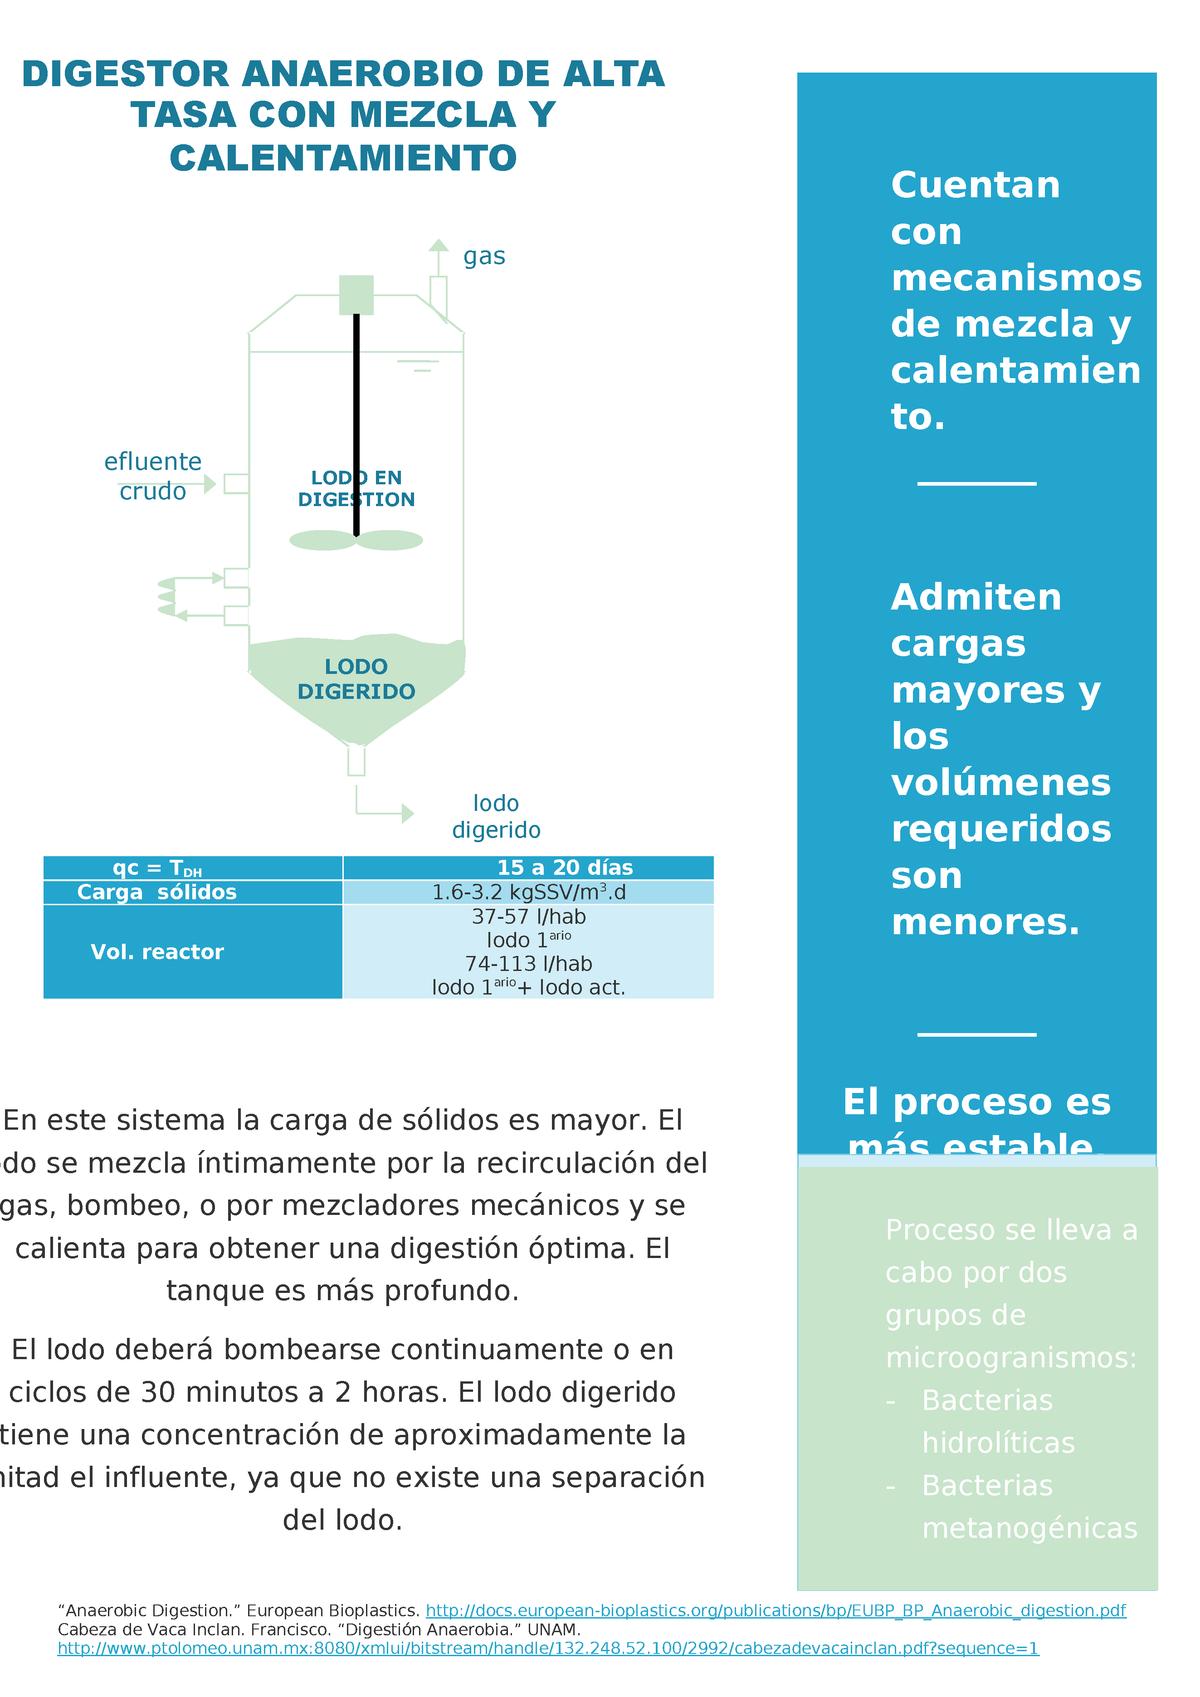 10 digestor anaerobio de alta tasa - Bioquímica 2 - UAQ